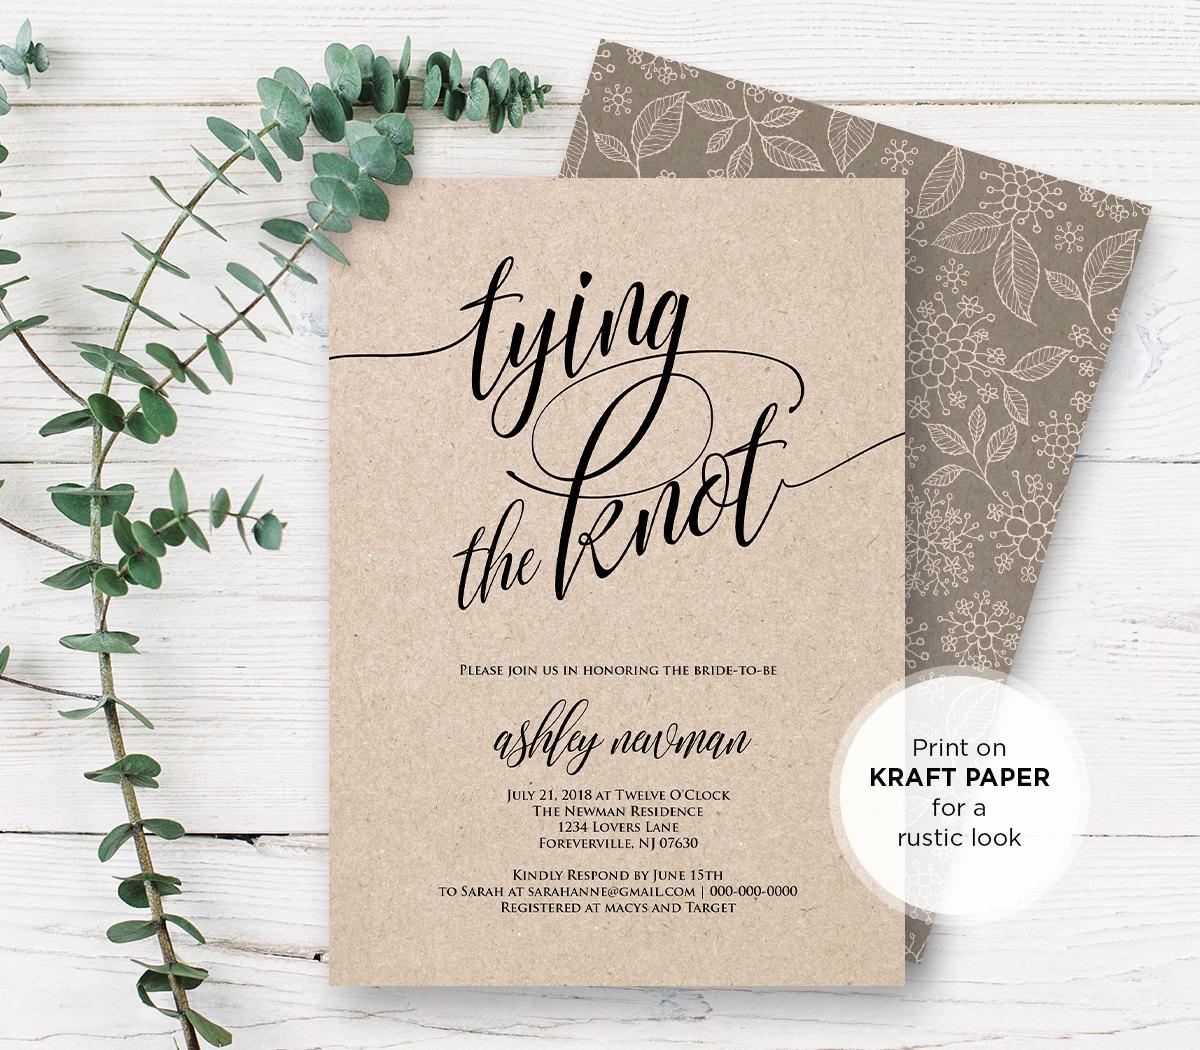 Free Rustic Wedding Invitation Templates Elegant Rustic Bridal Shower Invitation Printable Tying the Knot